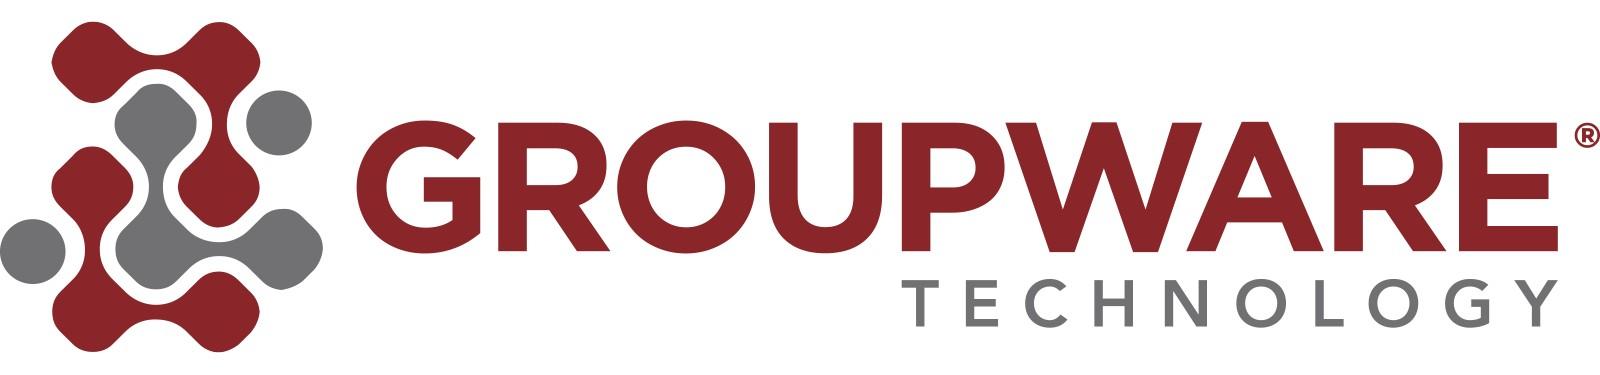 Groupware Logo.jpg